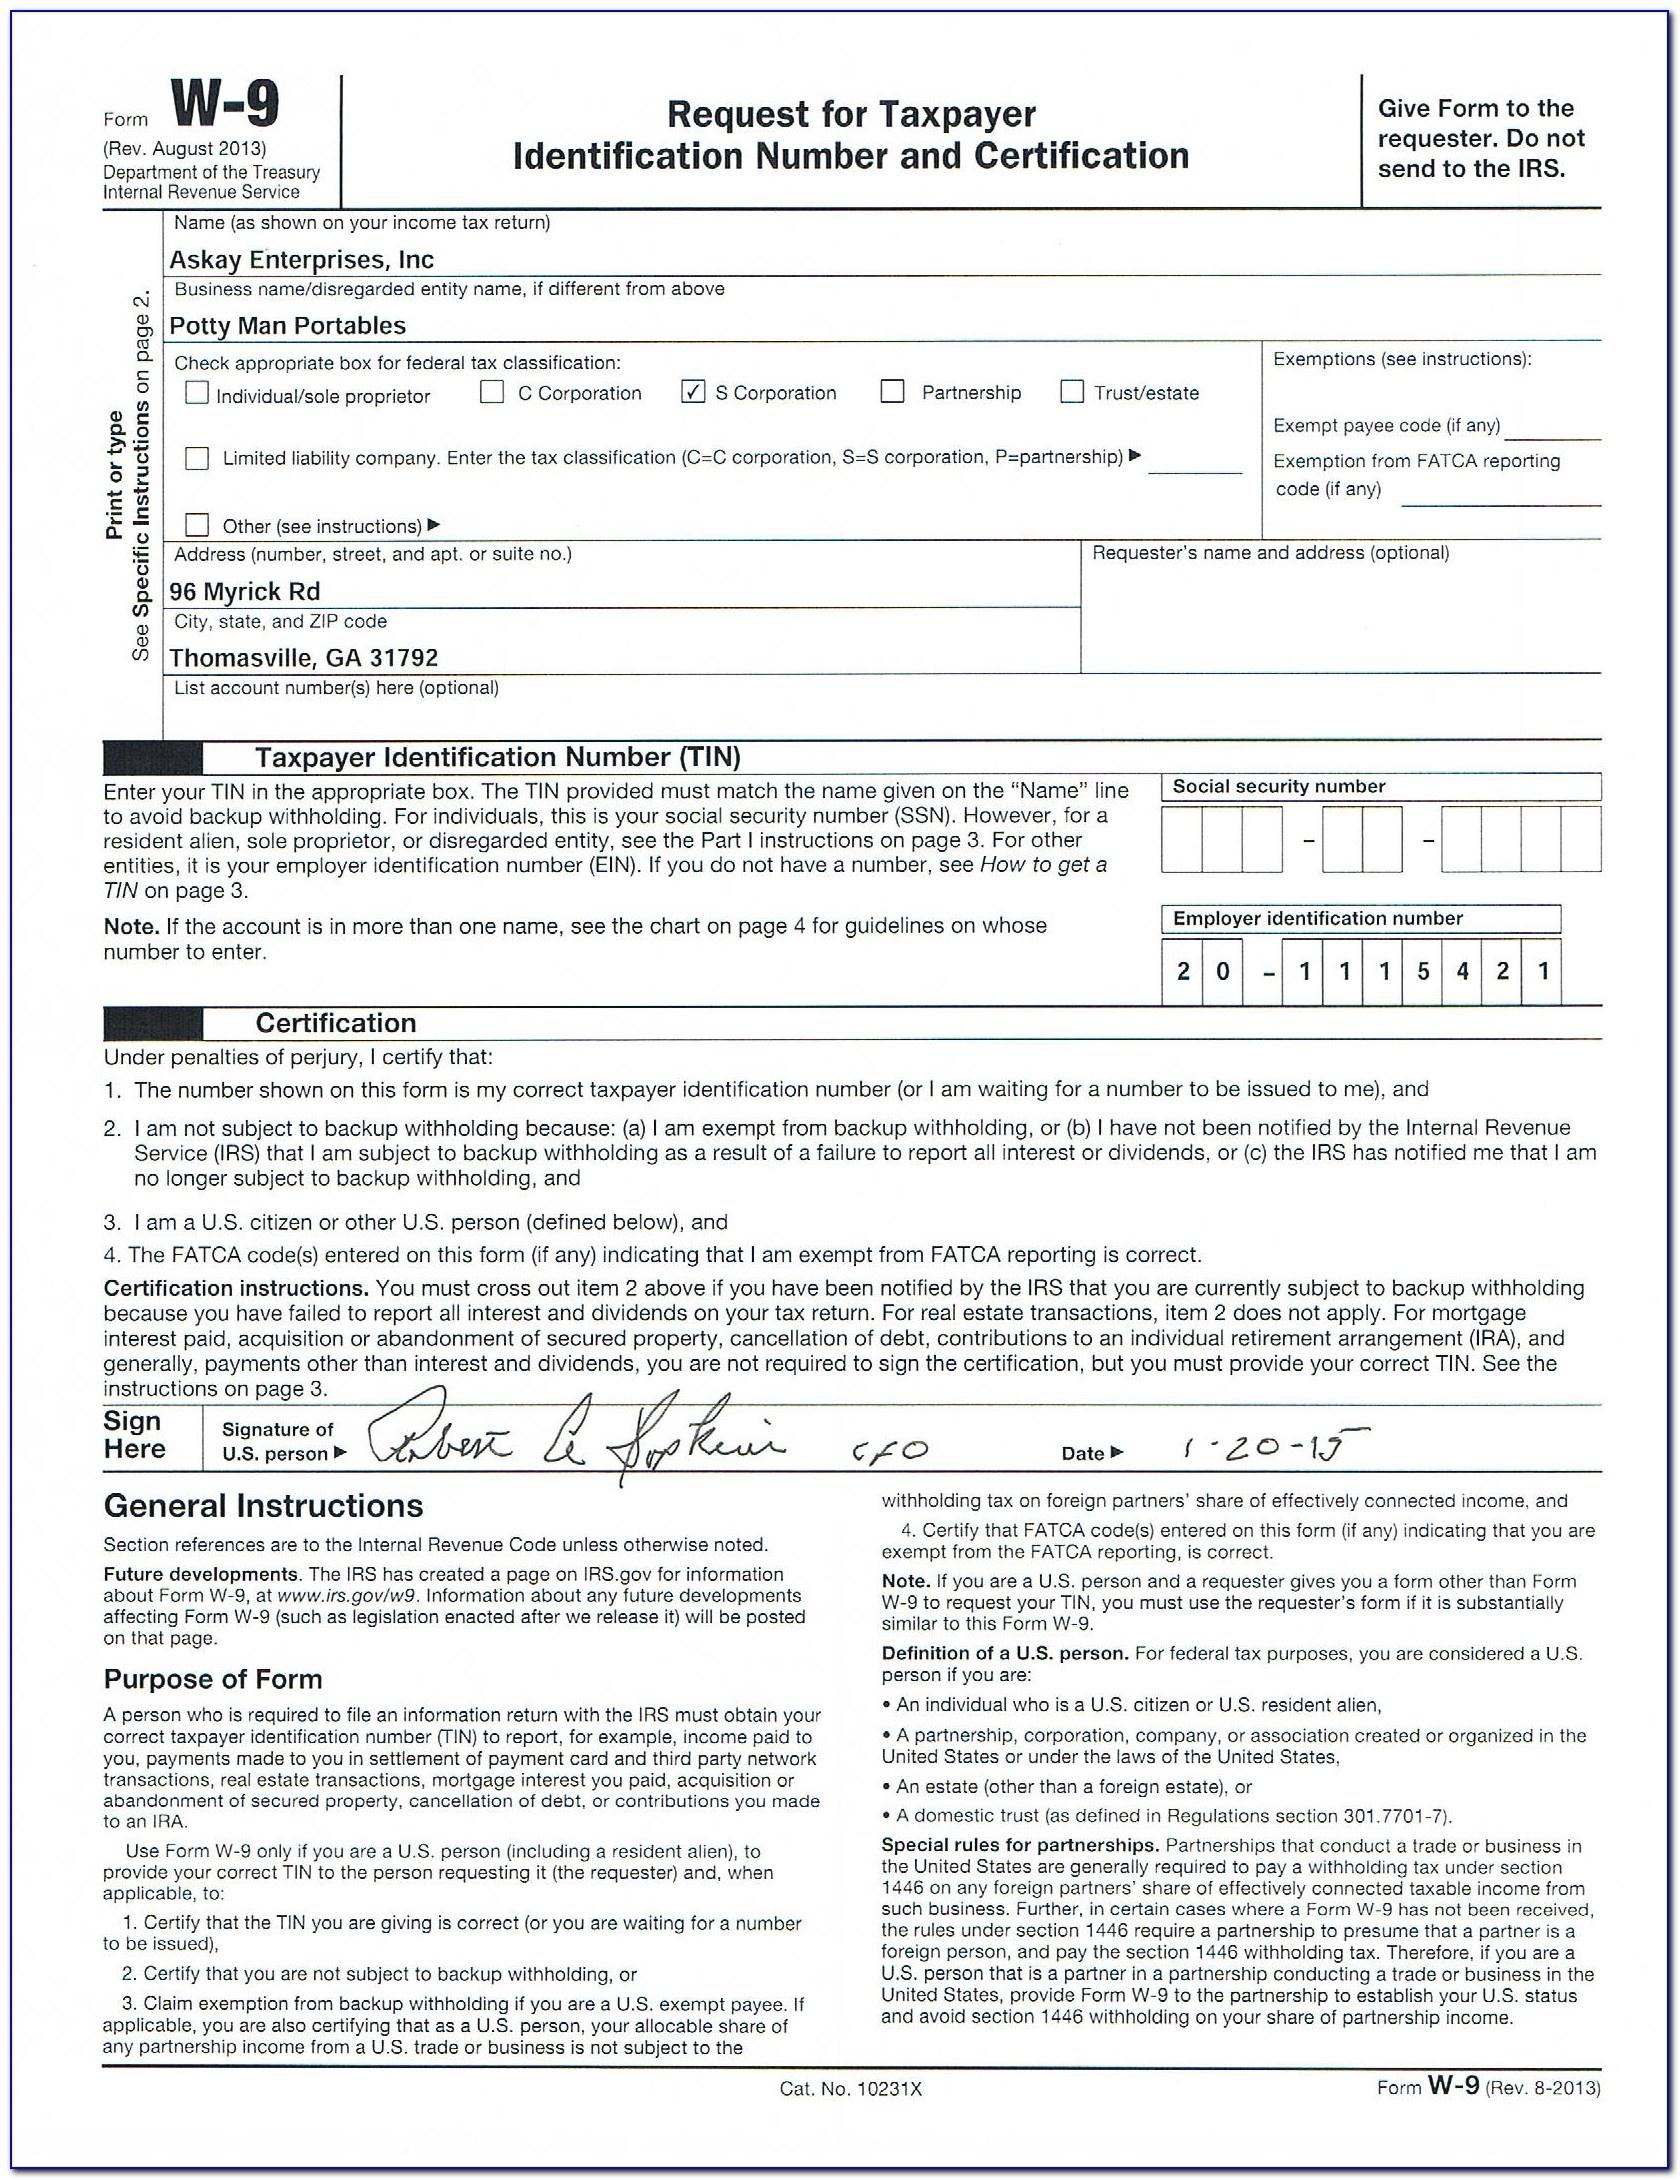 W9 Free Printable Form 2016 - Form : Resume Examples #x6Ped3Vlad - Free Printable W9